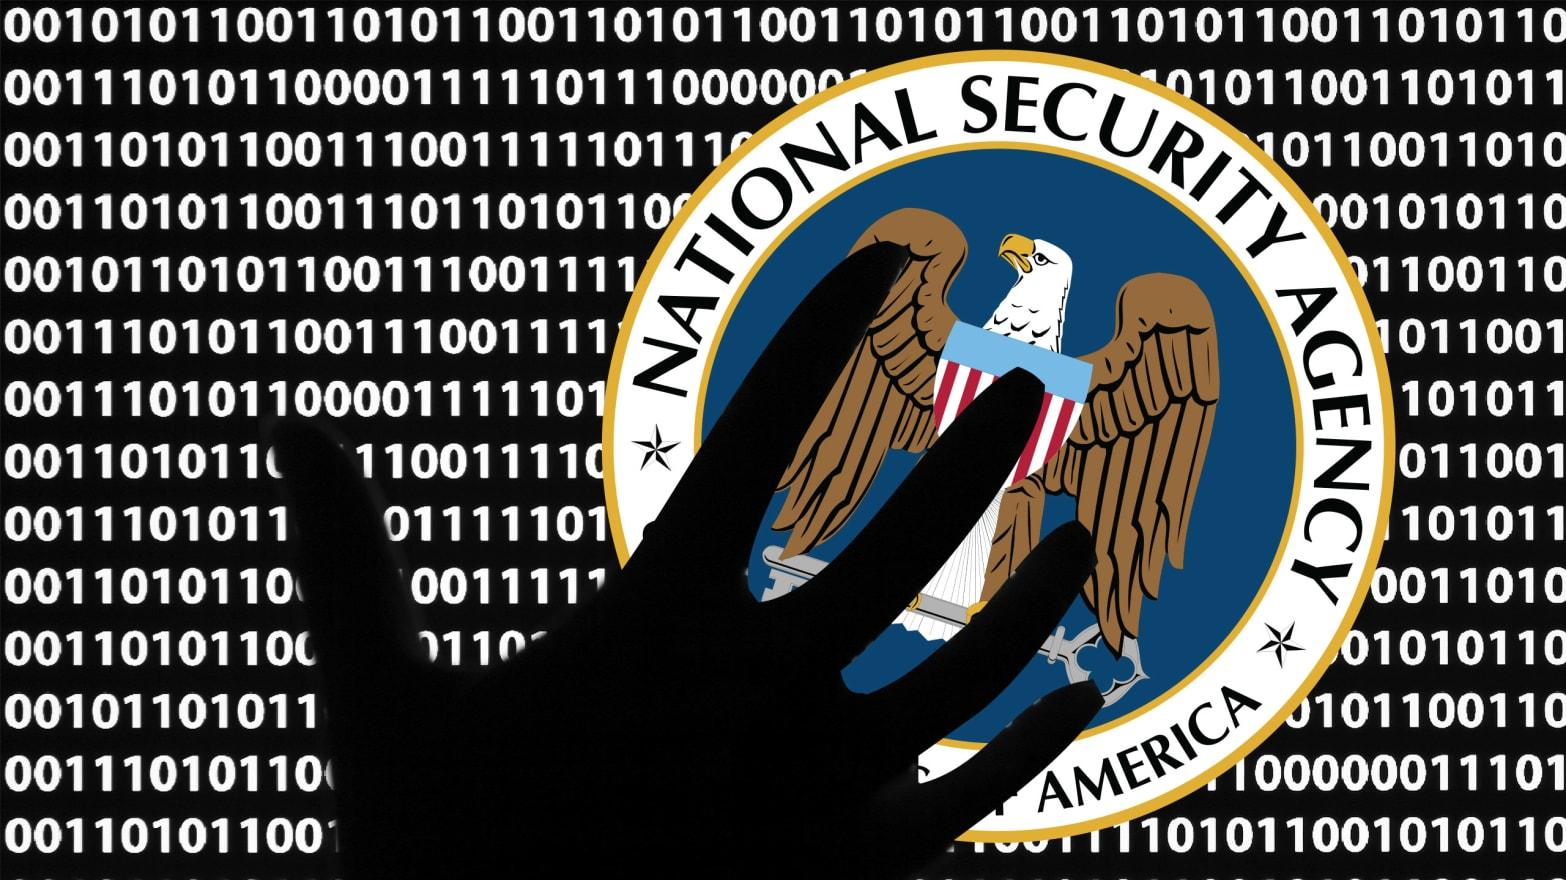 How the NSA Became a Killing Machine